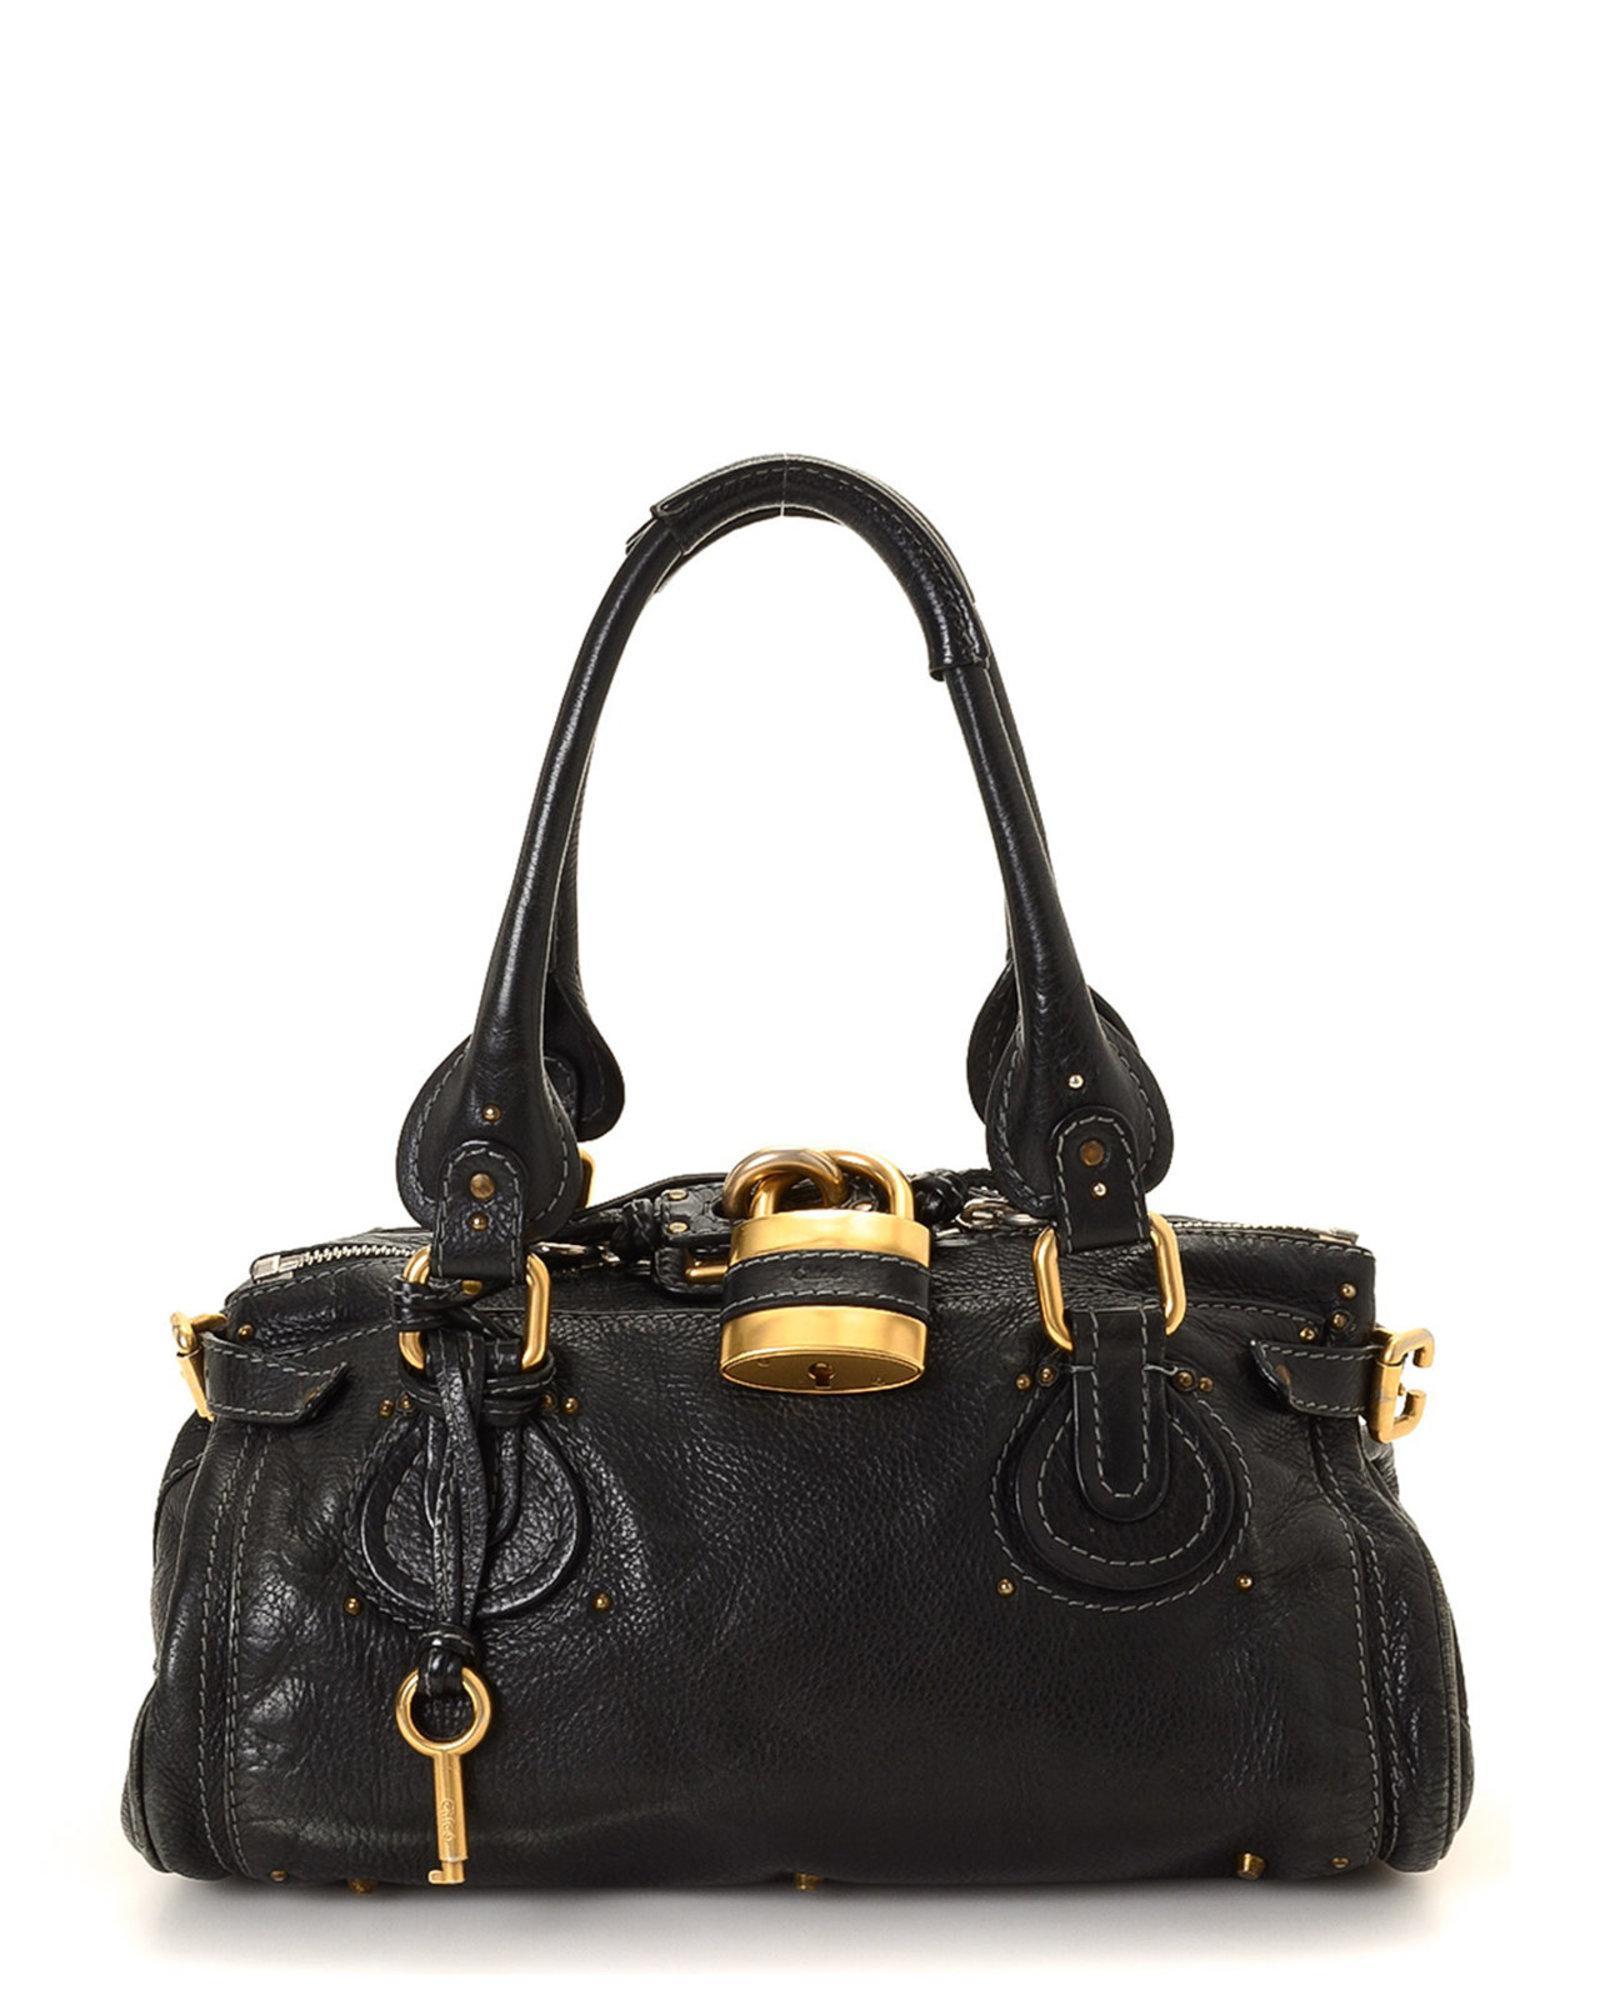 25bafd0e903c Lyst - Chloé Paddington Handbag - Vintage in Black